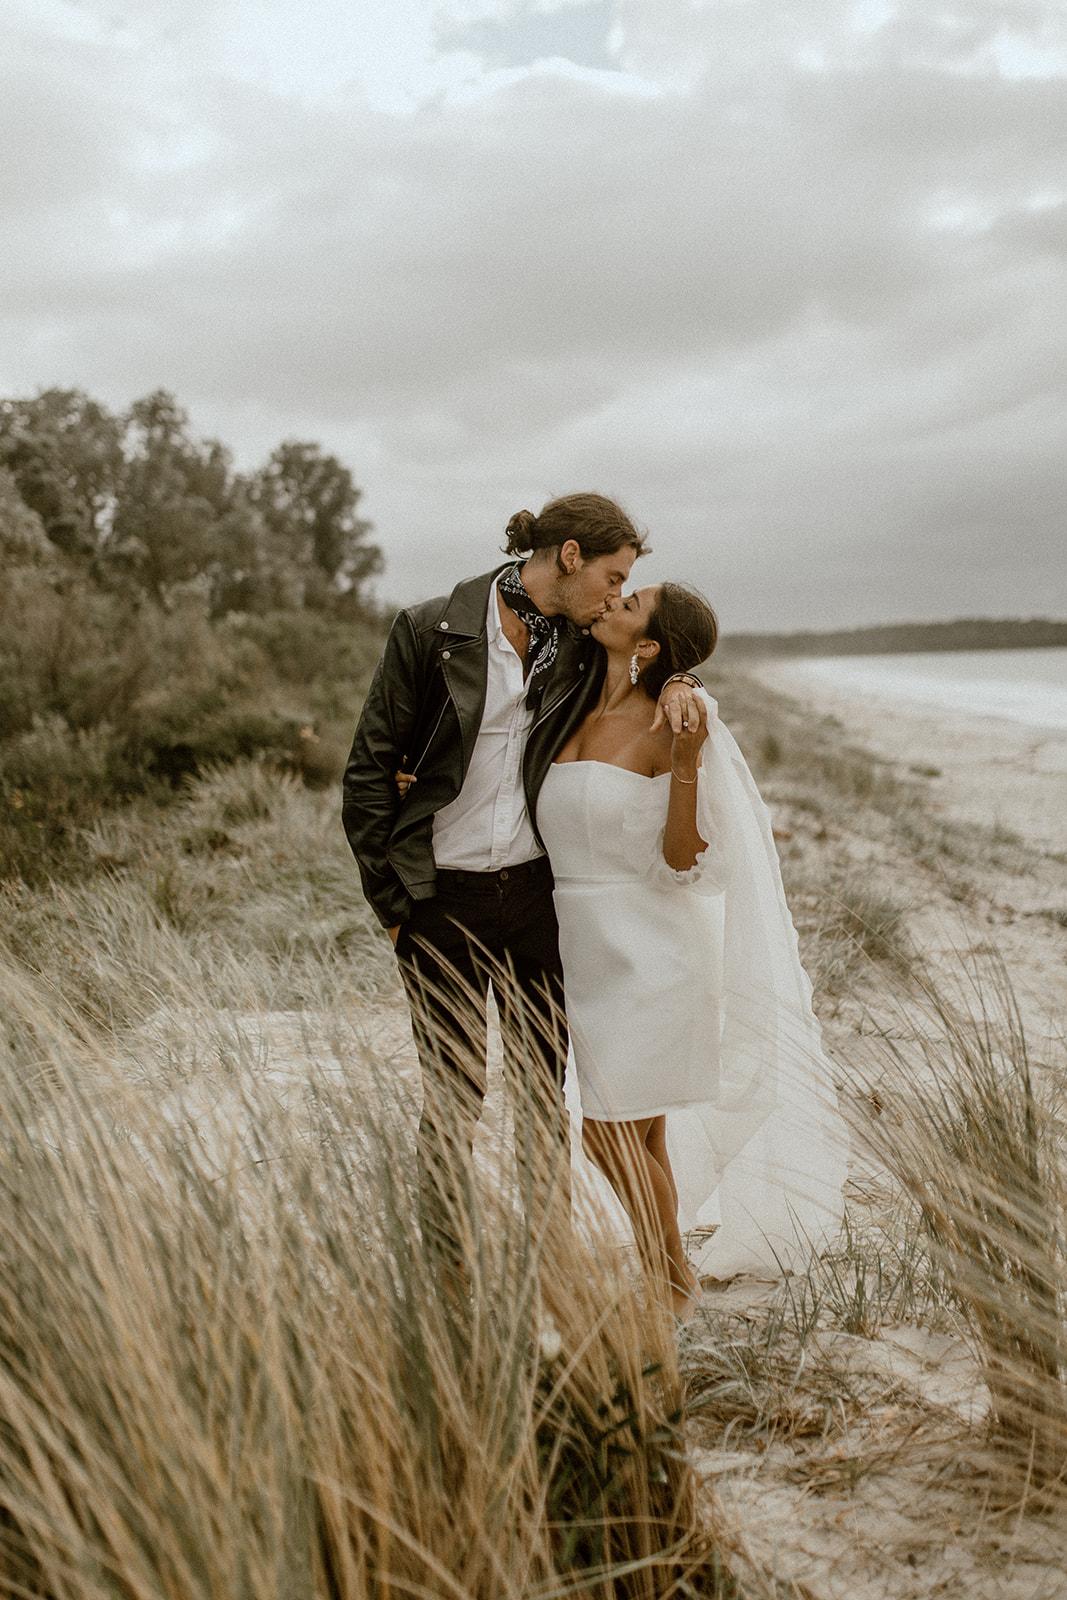 images by hayley rafton photo fun beach elopement inspiration shoot karen willis holmes floral styling